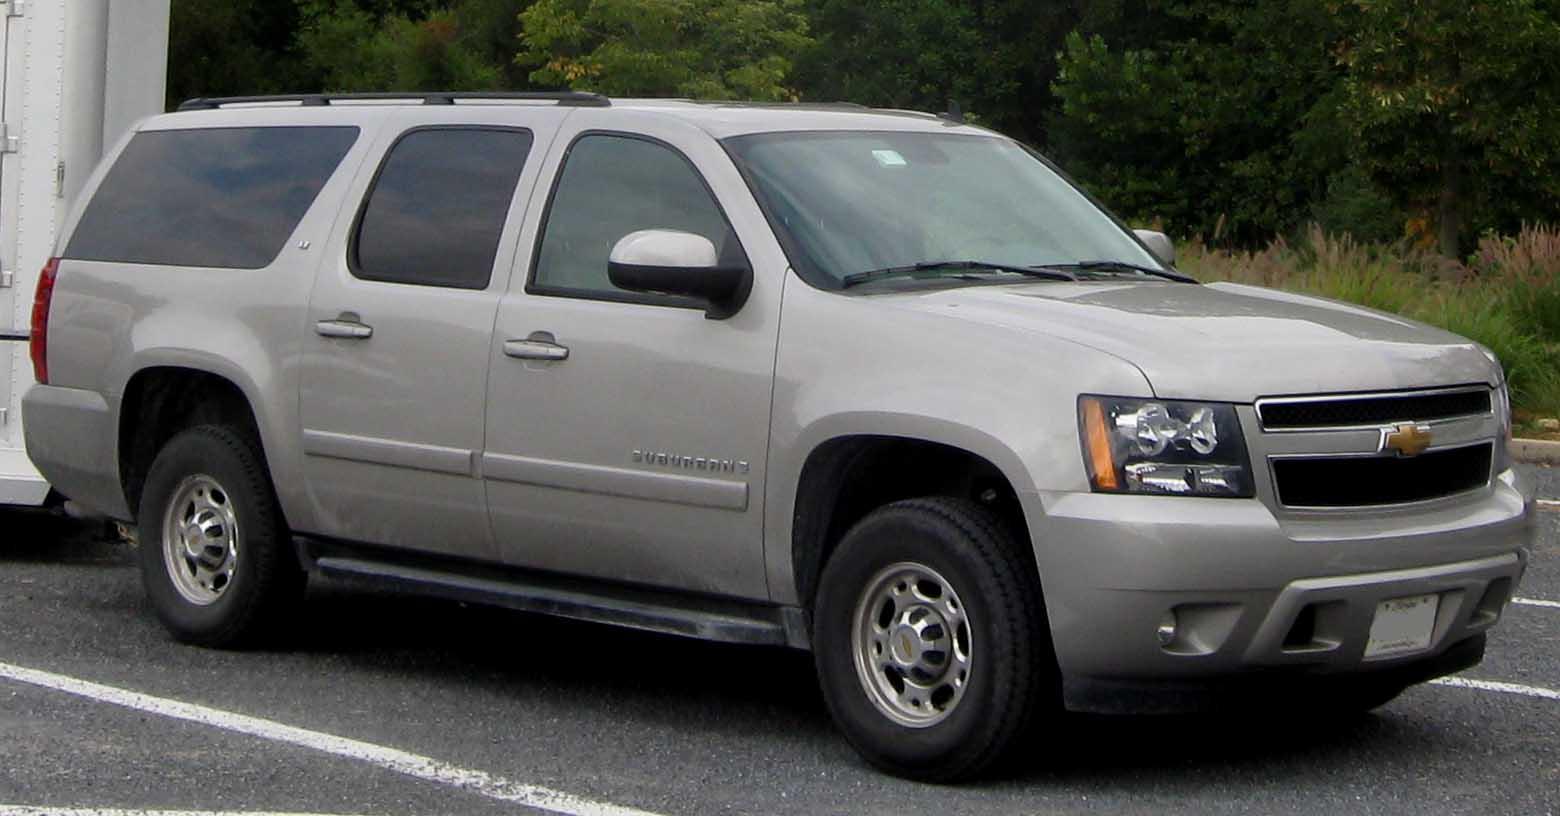 Chevrolet Suburban 2009 foto - 1